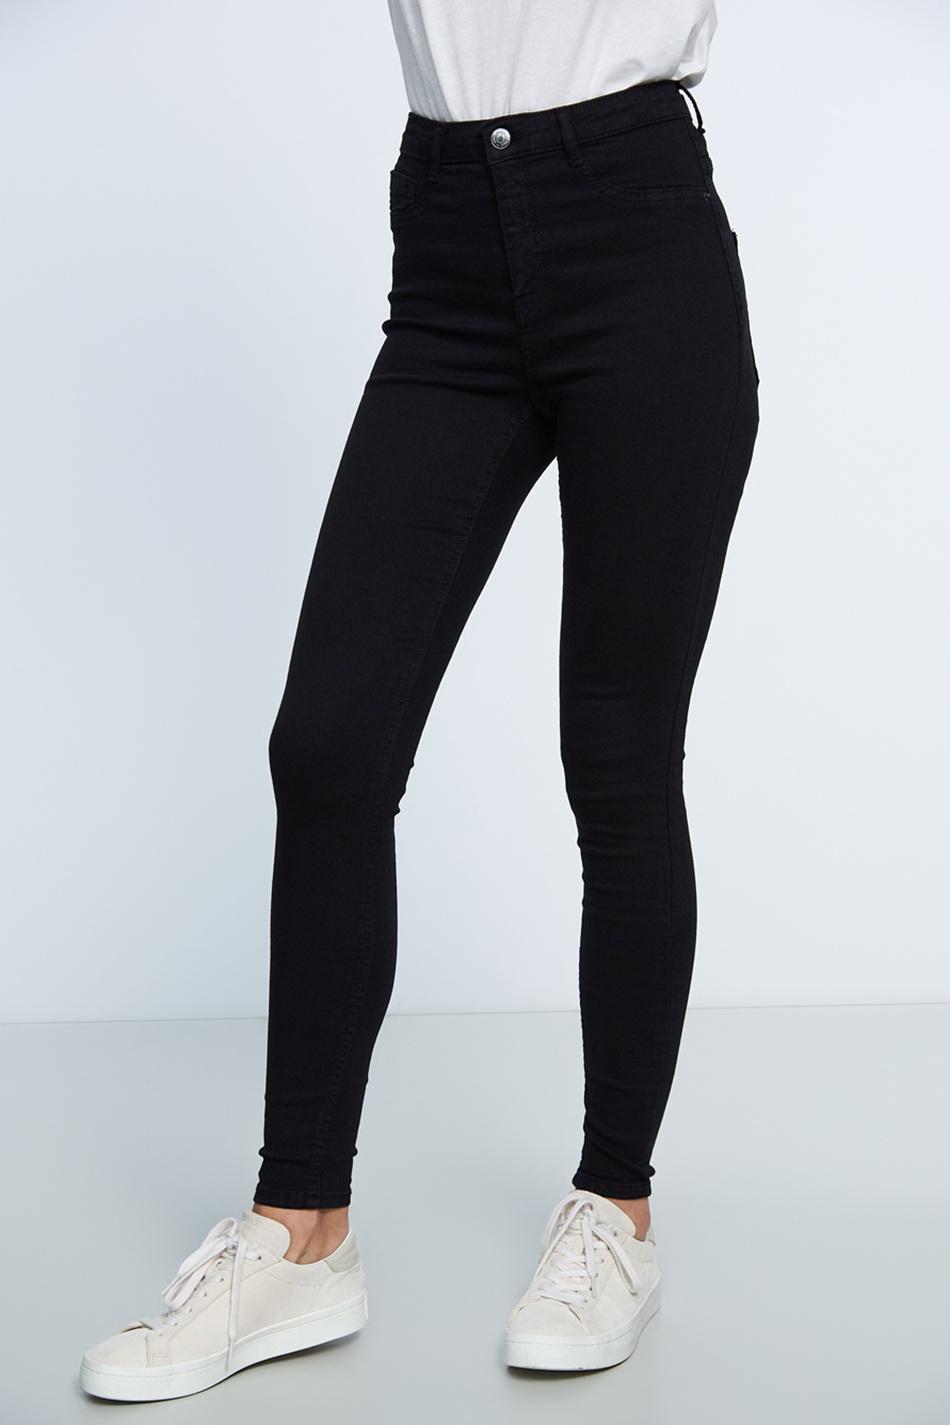 76316900001molly-highwaist-jeans-sort